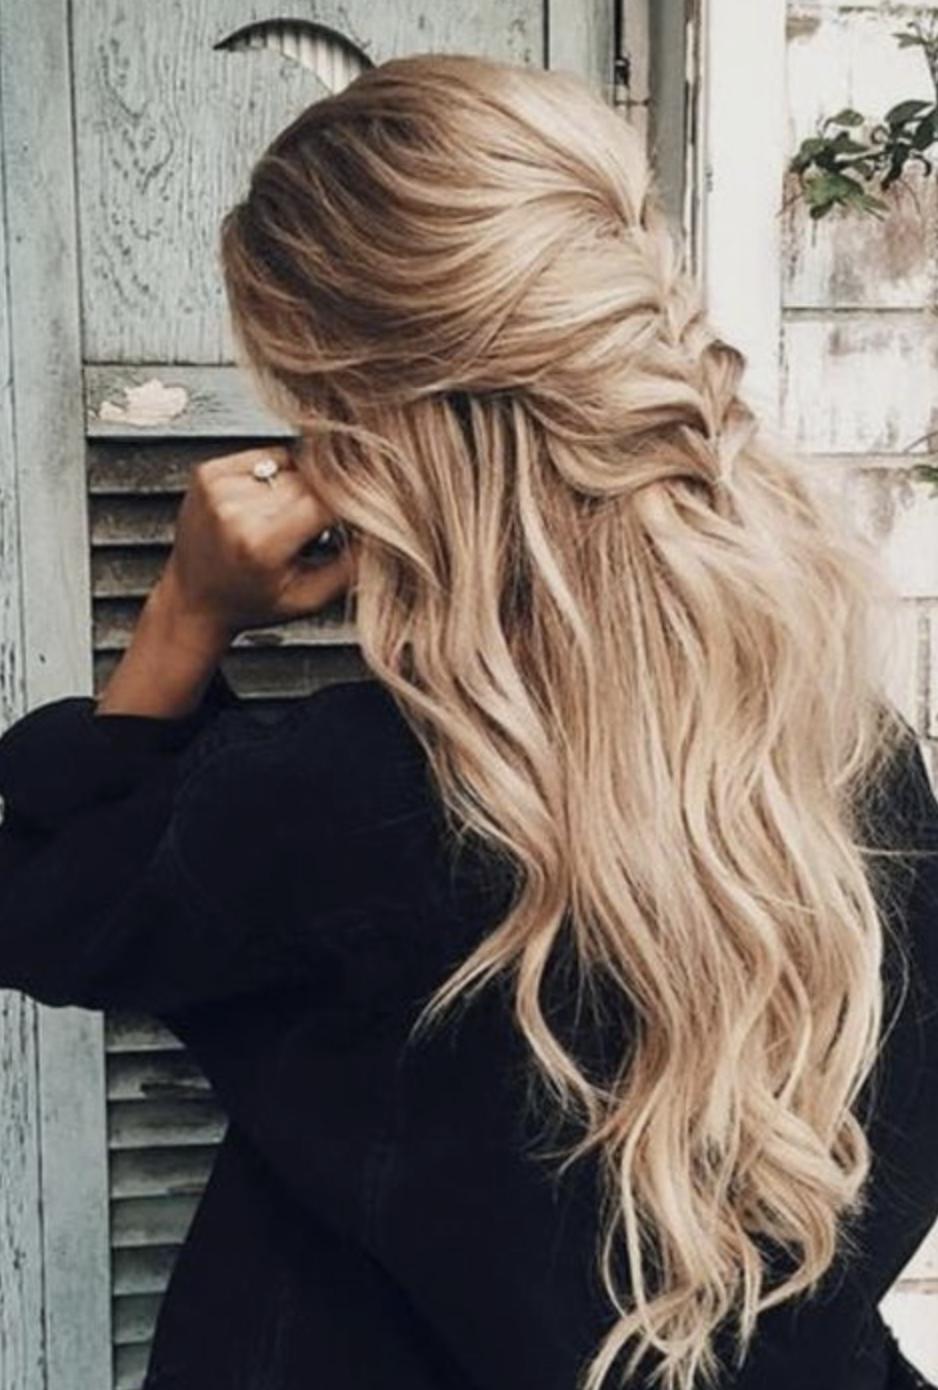 Pin by hailey carlson on braided pinterest hair style hair